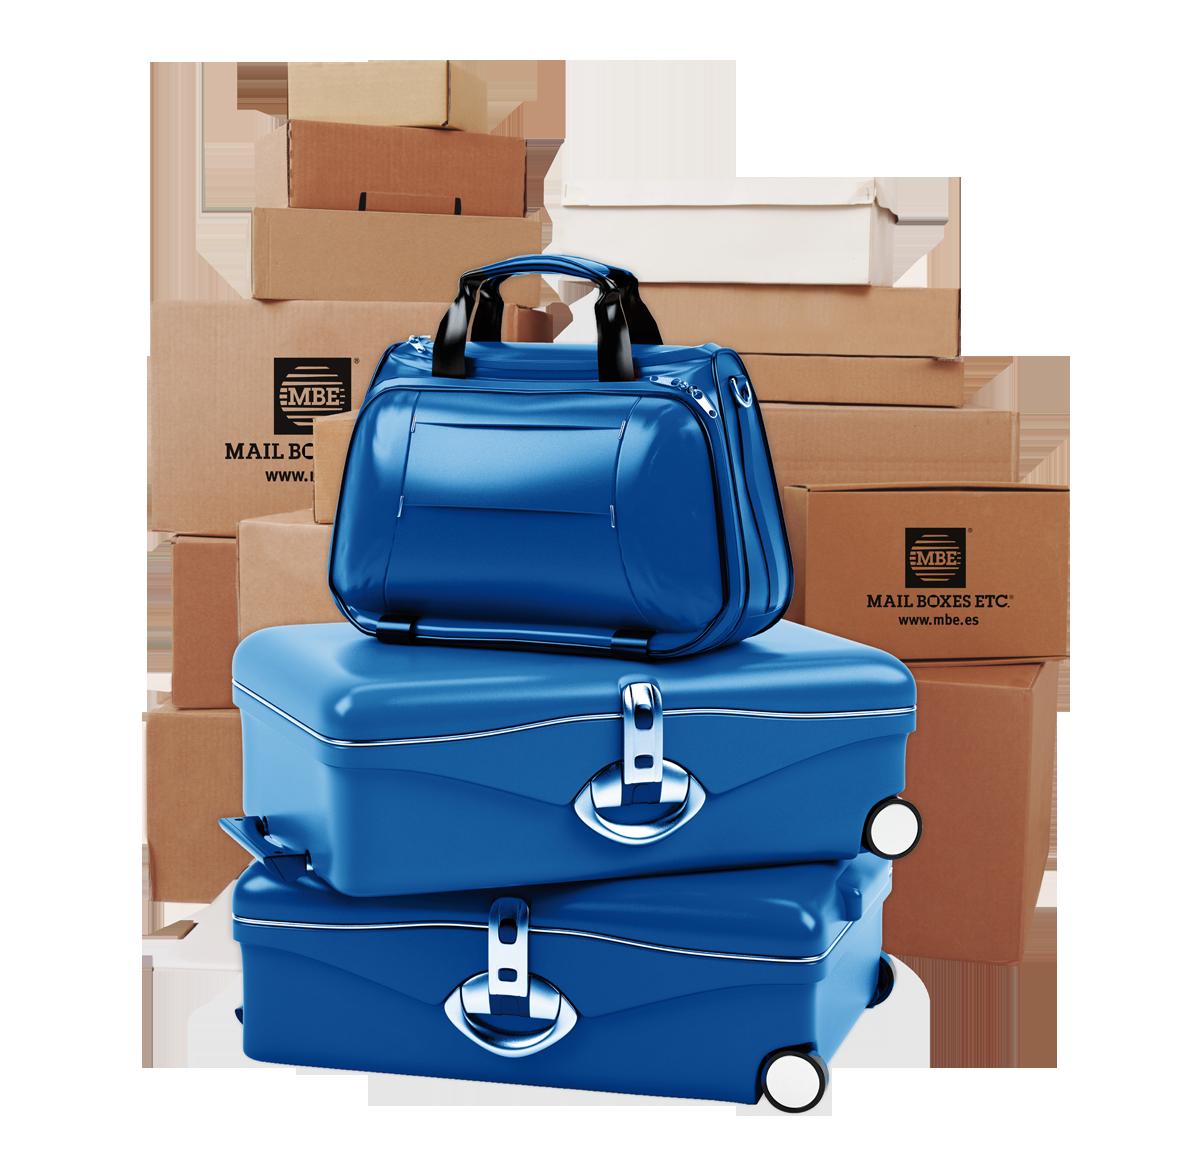 10% descuento para socios de Usabal en envío de equipaje